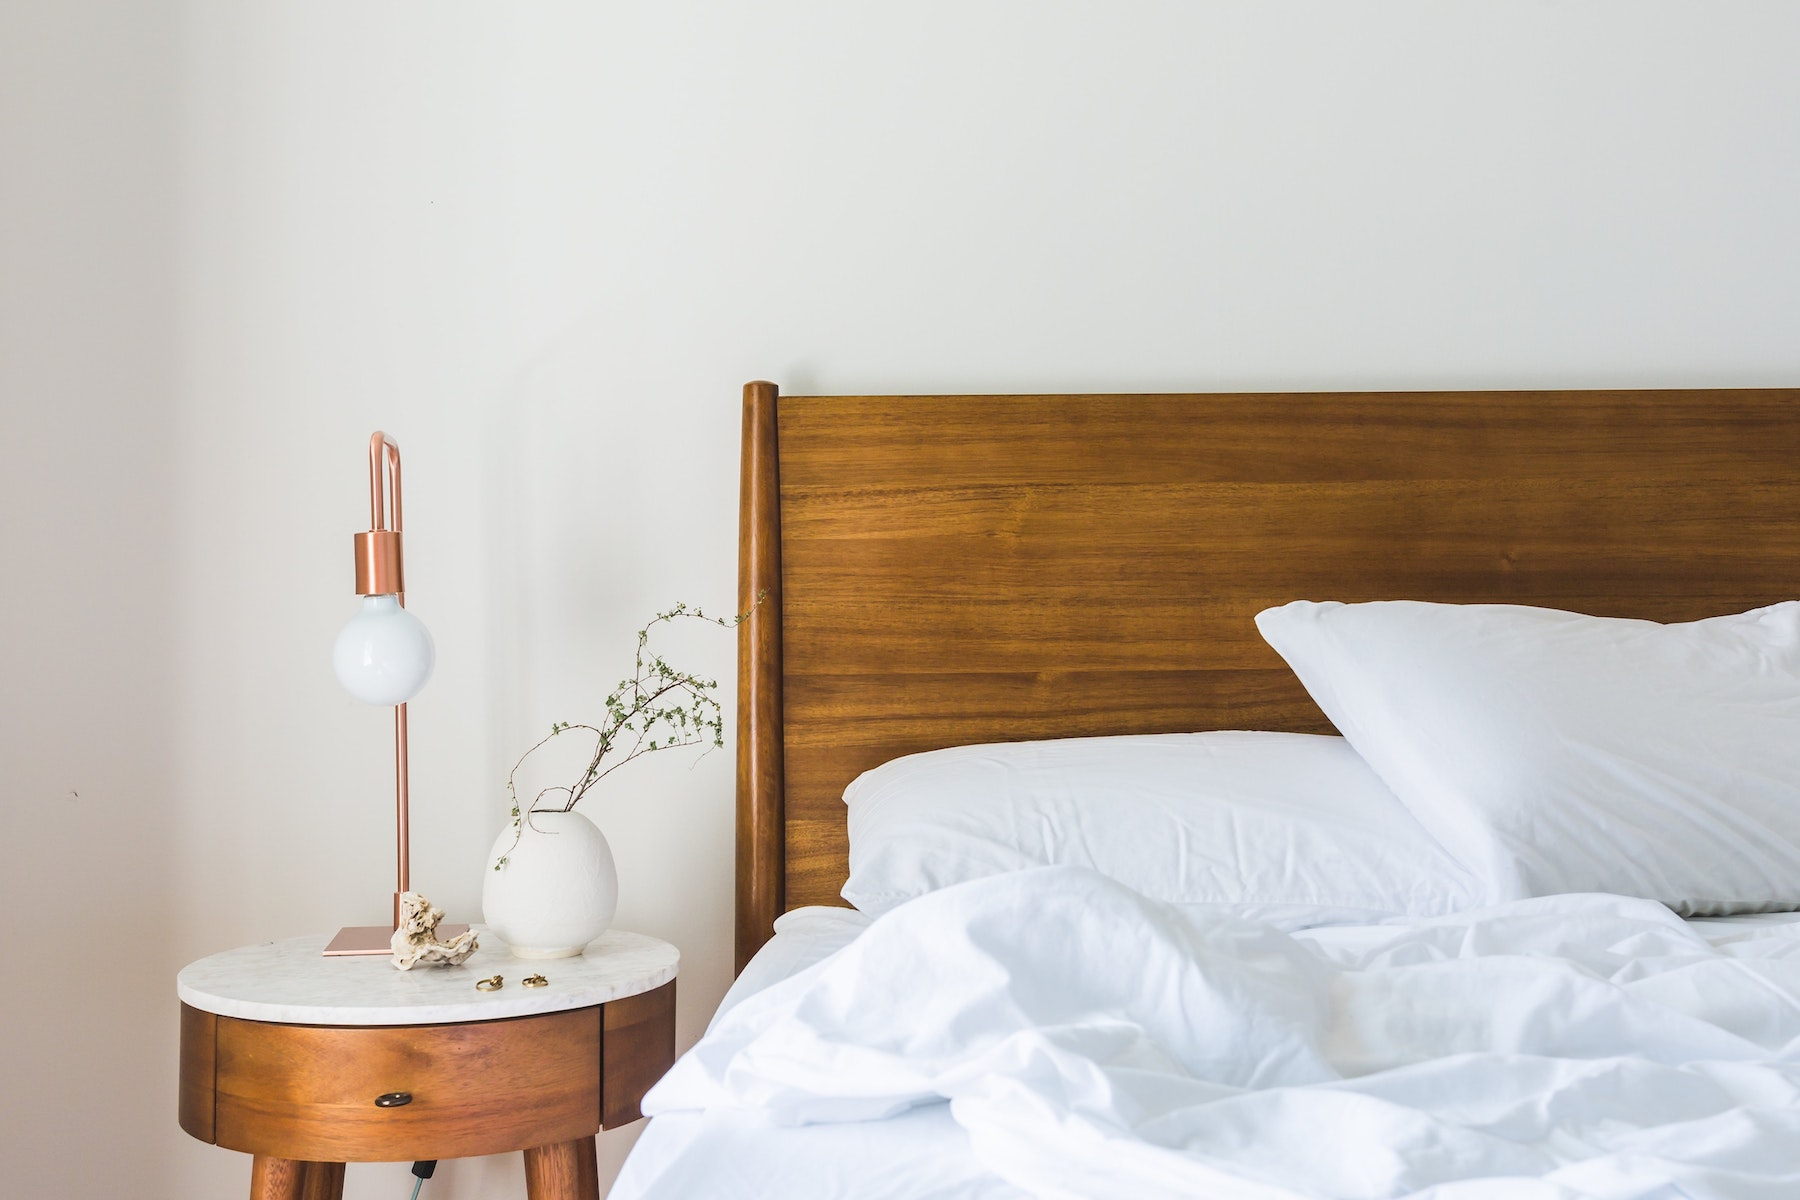 omslagsbild med en säng hos designinredning